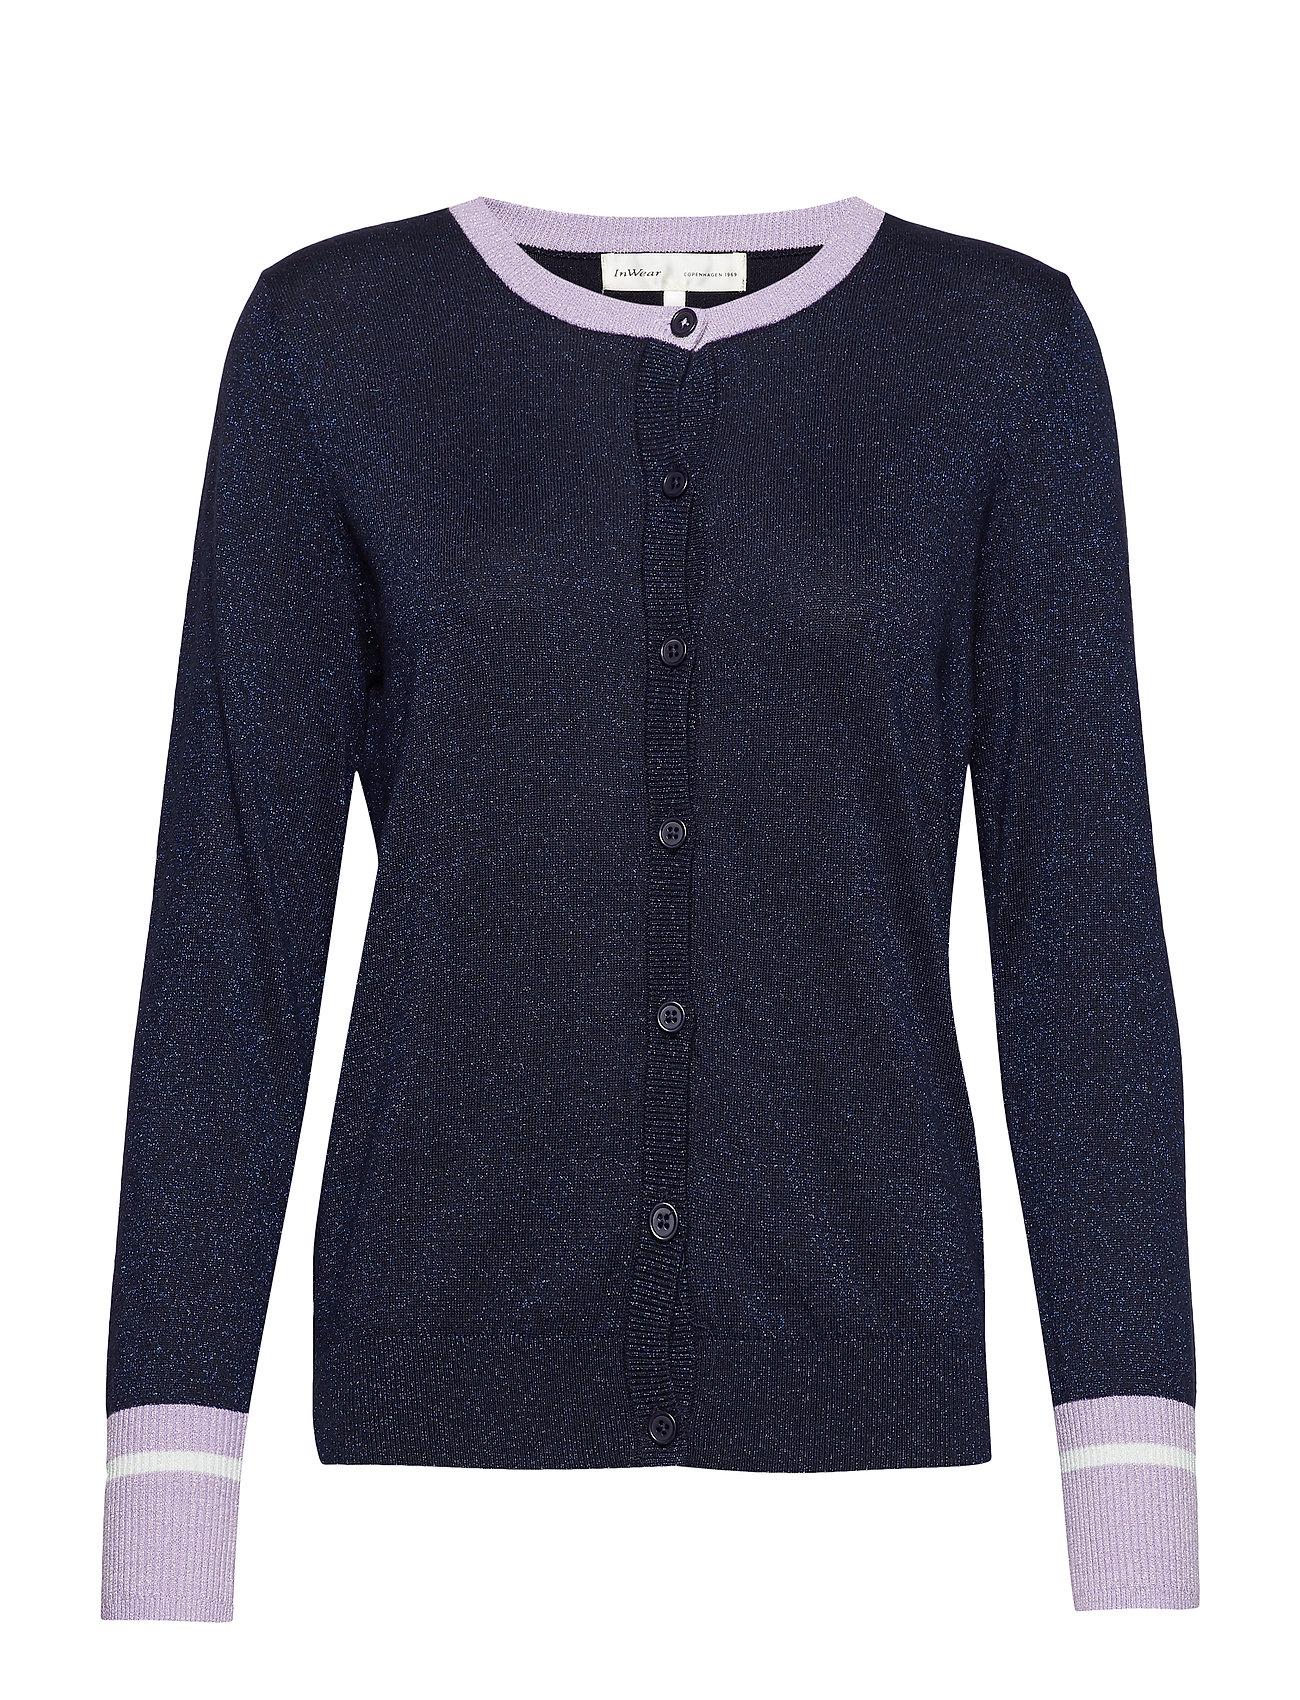 8a8821b4 InWear cardigans – Zabine Cardigan til dame i MARINE BLUE - Pashion.dk